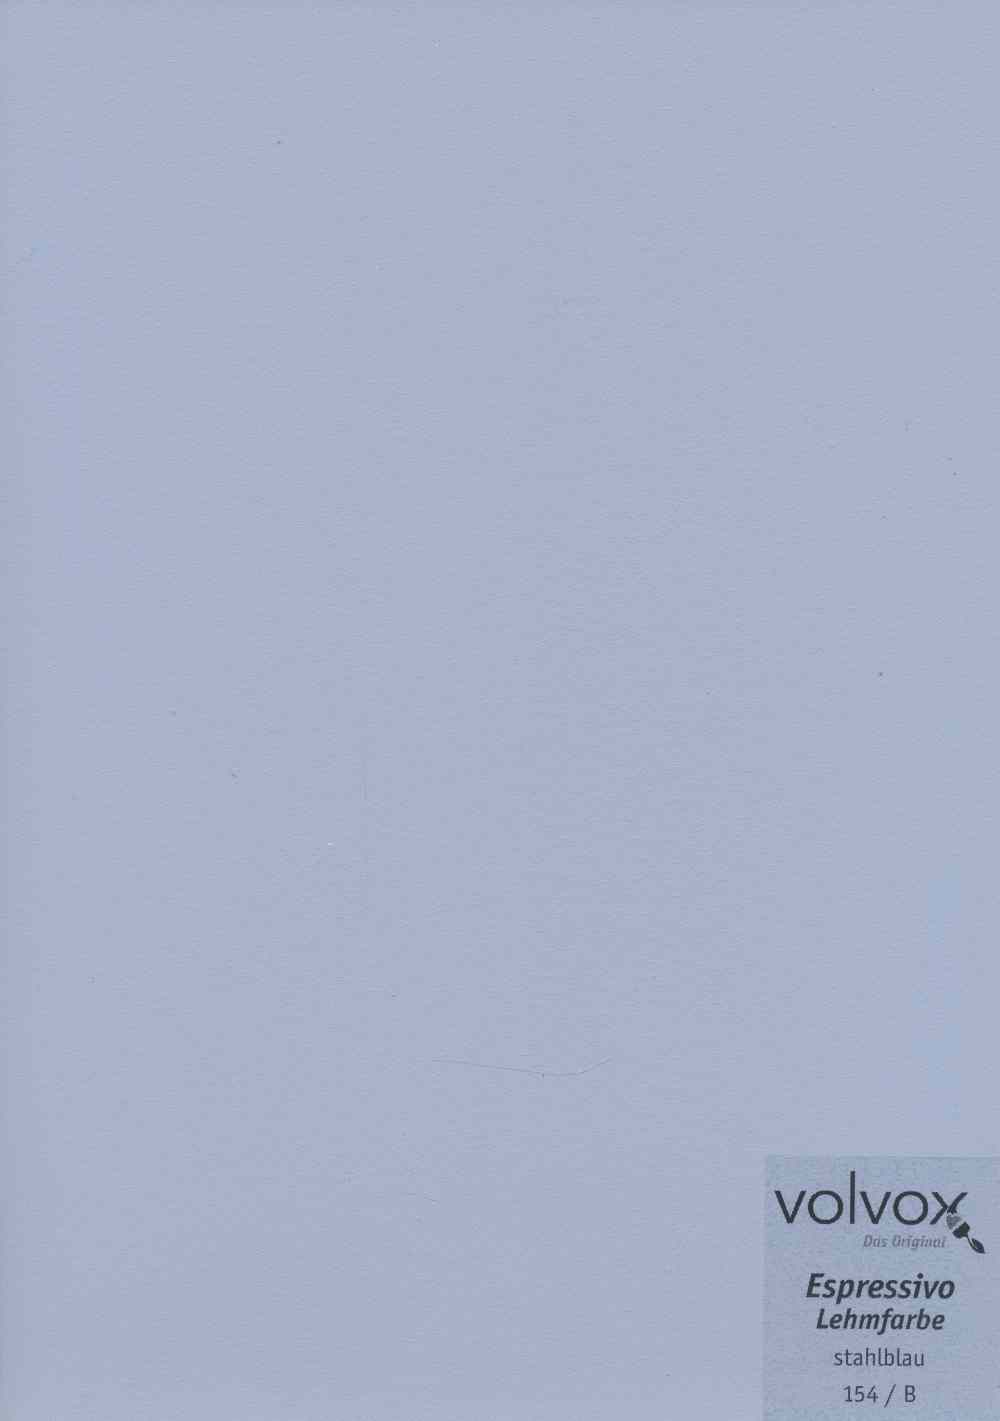 Volvox Espressivo Lehmfarbe 154 stahlblau